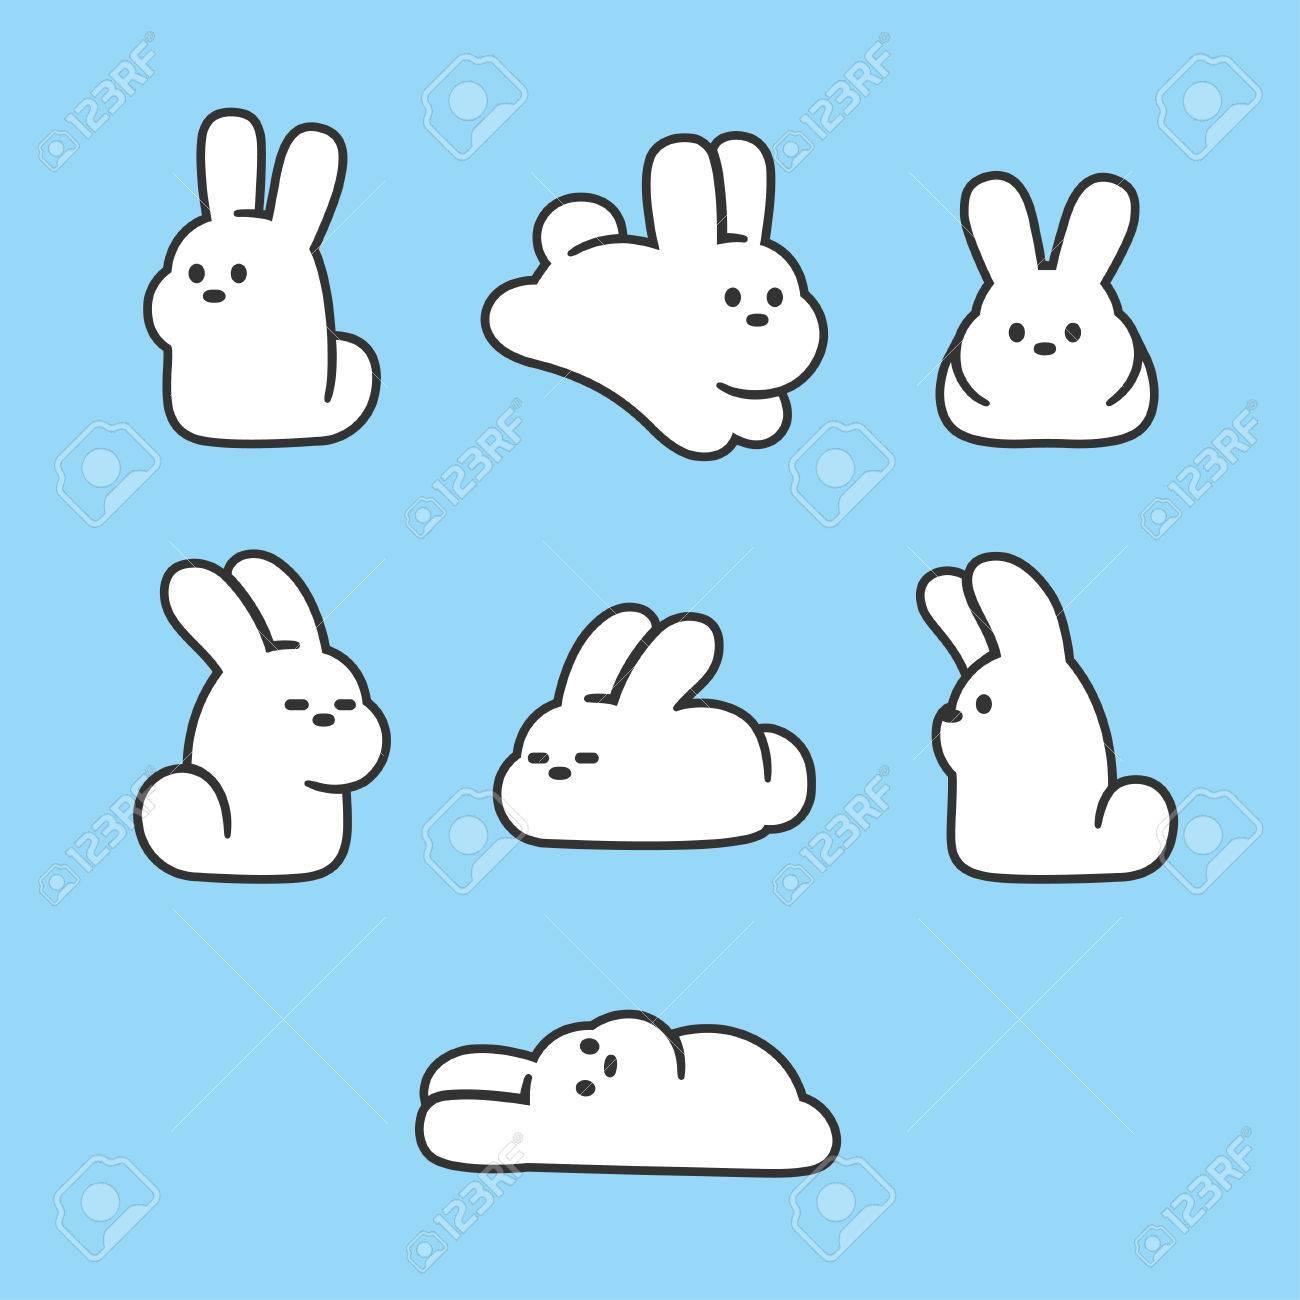 cute cartoon rabbits set simple hand drawn white bunnies in